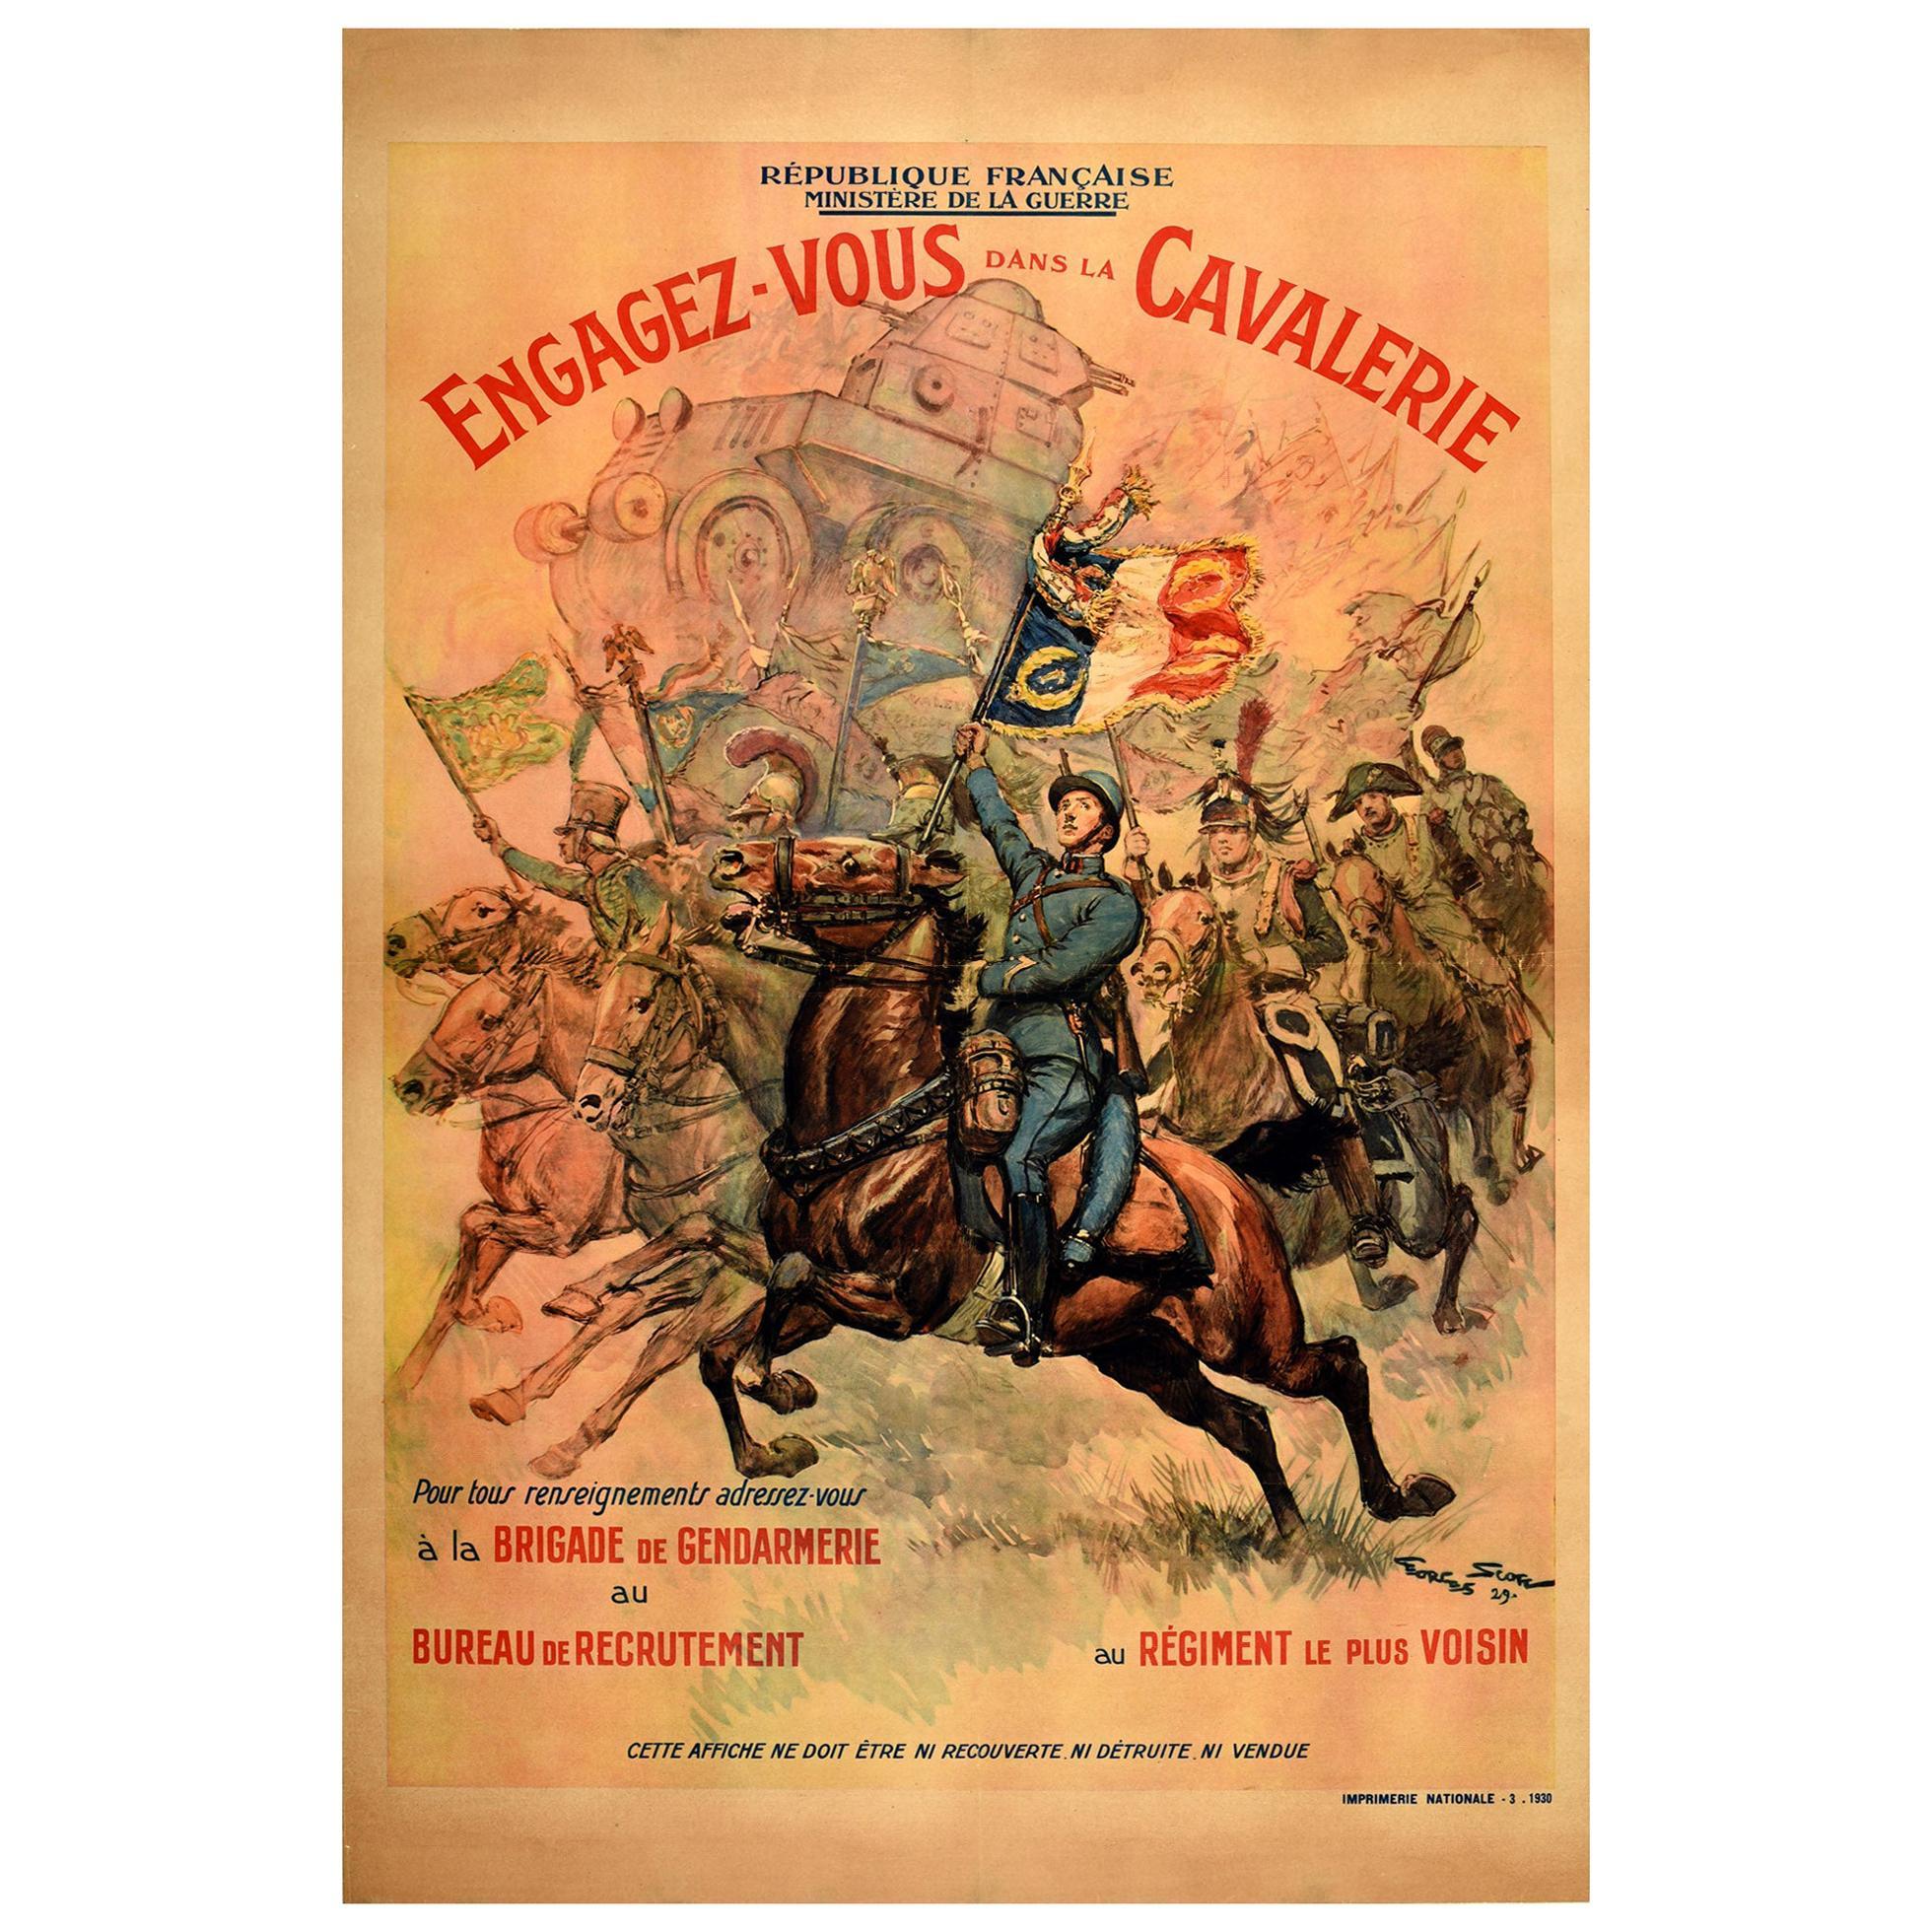 Original Vintage Poster French Military Recruitment Cavalry Regiment Cavalerie